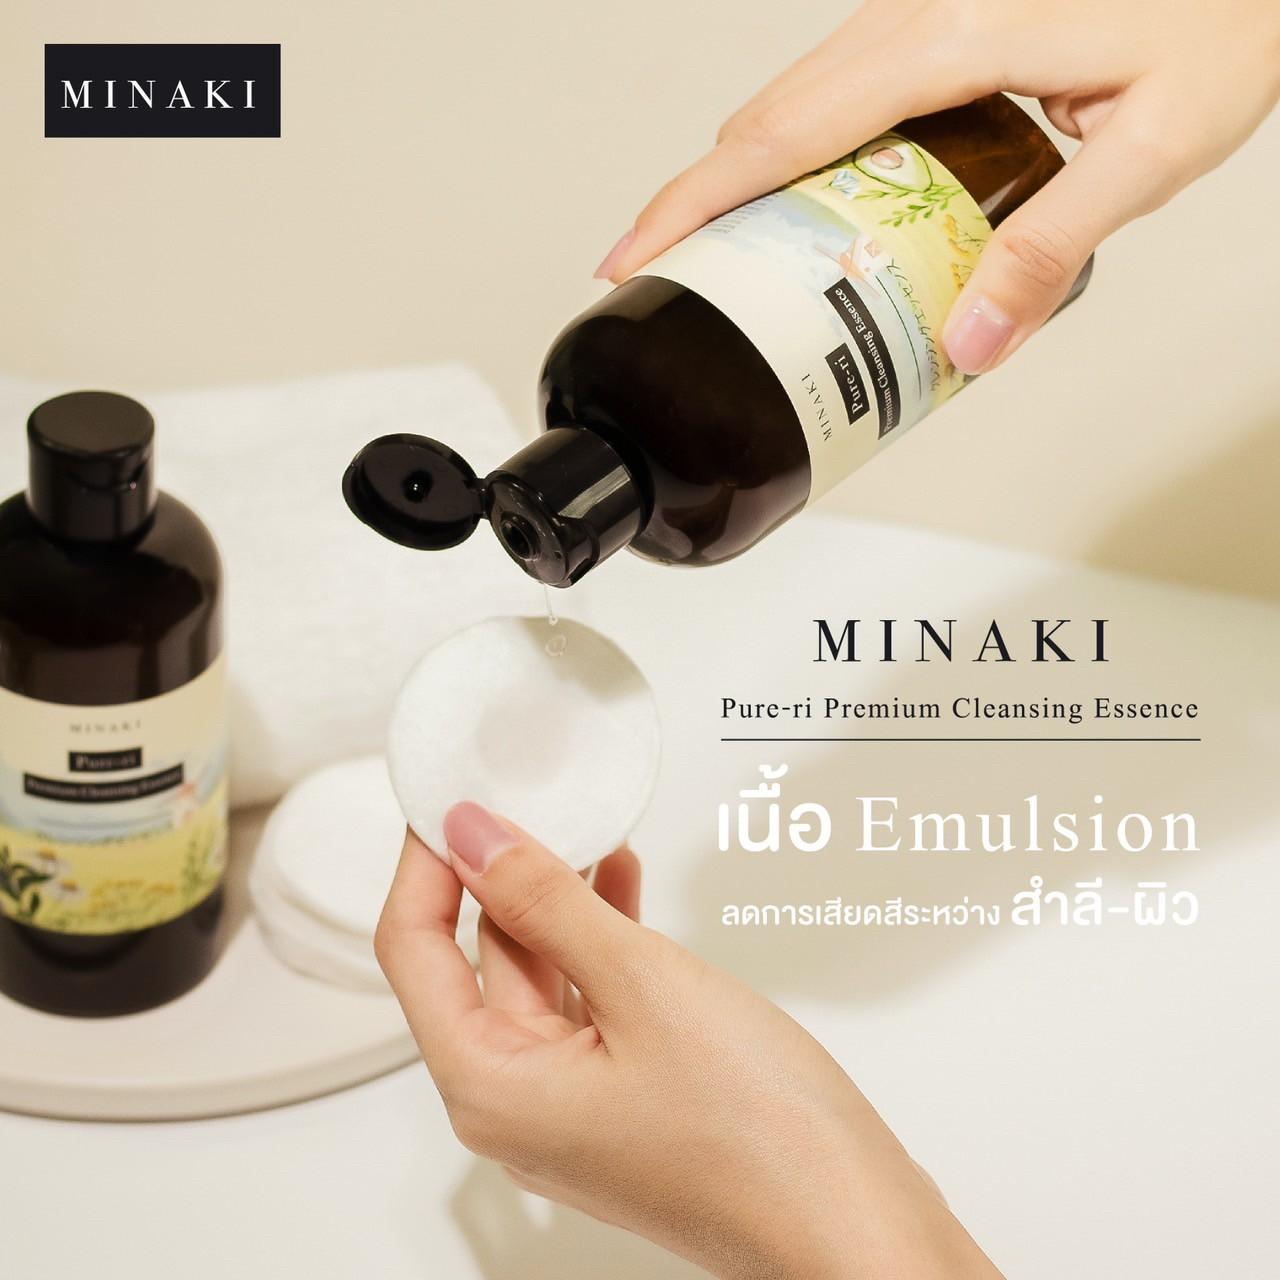 Pure-ri Perfect Cleansing Essence เพียวริ คลีนซิ่ง 300 ml